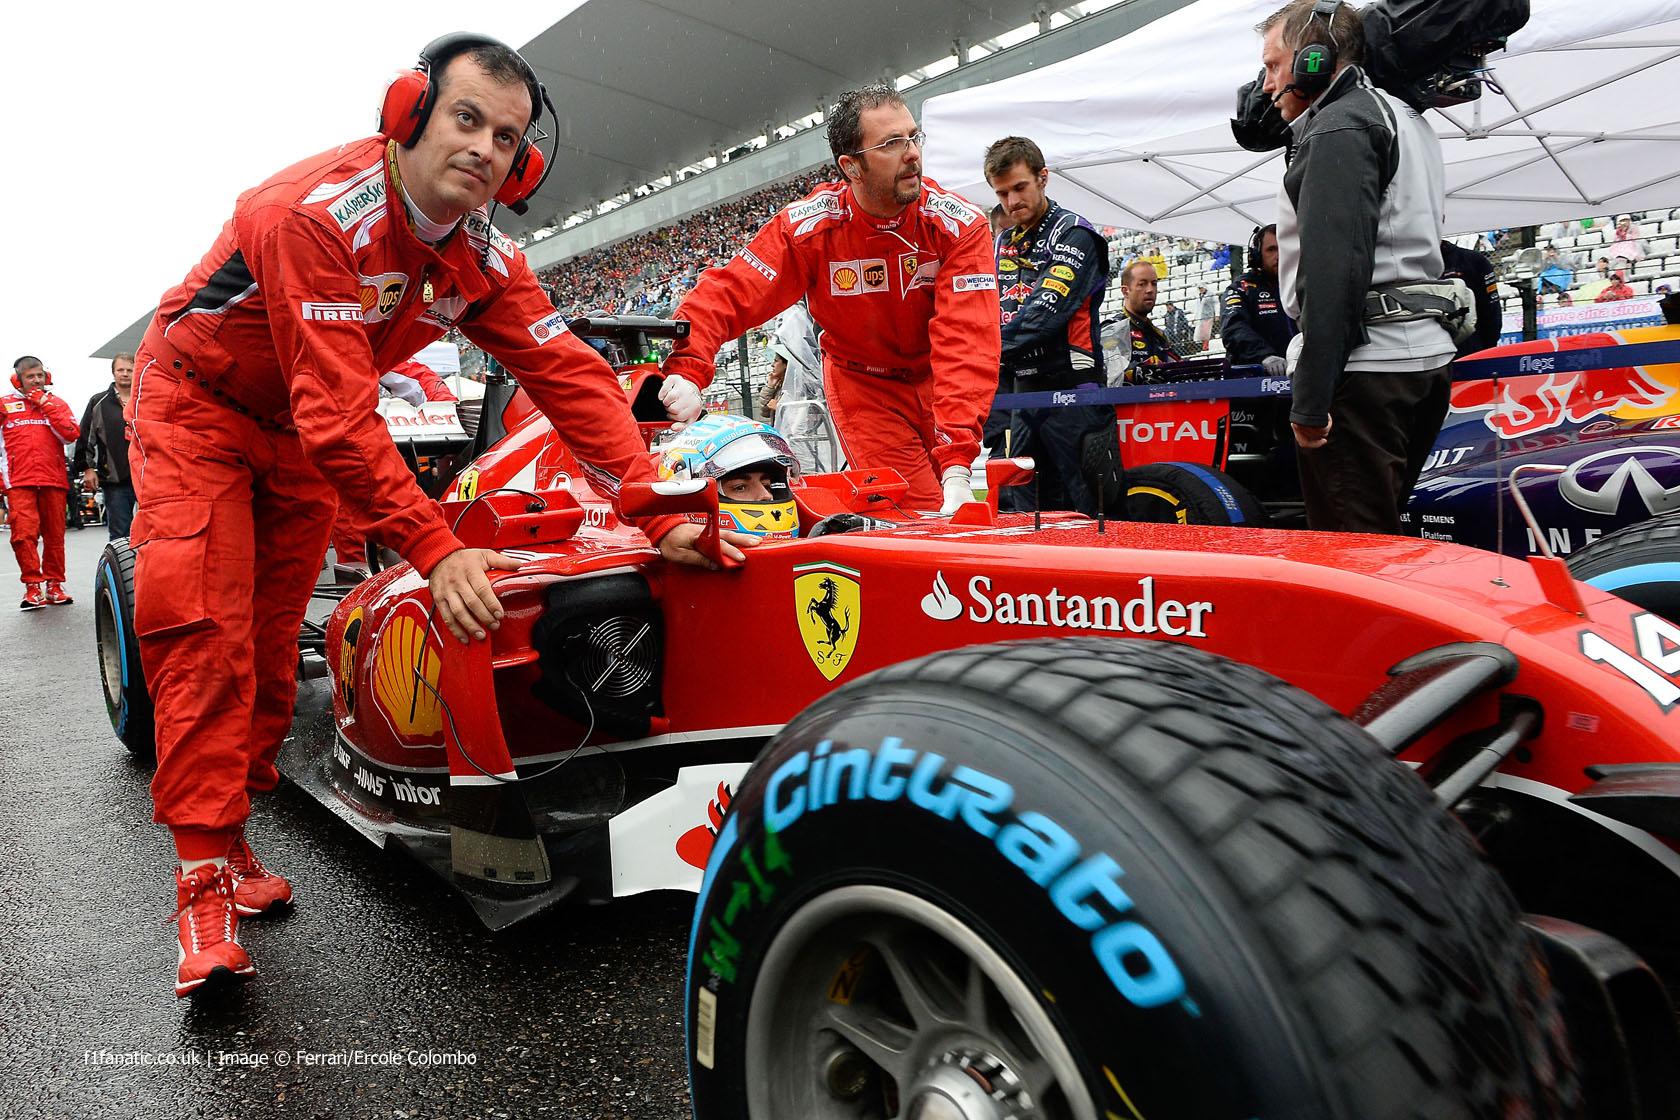 Fernando Alonso, Ferrari, Suzuka, 2014